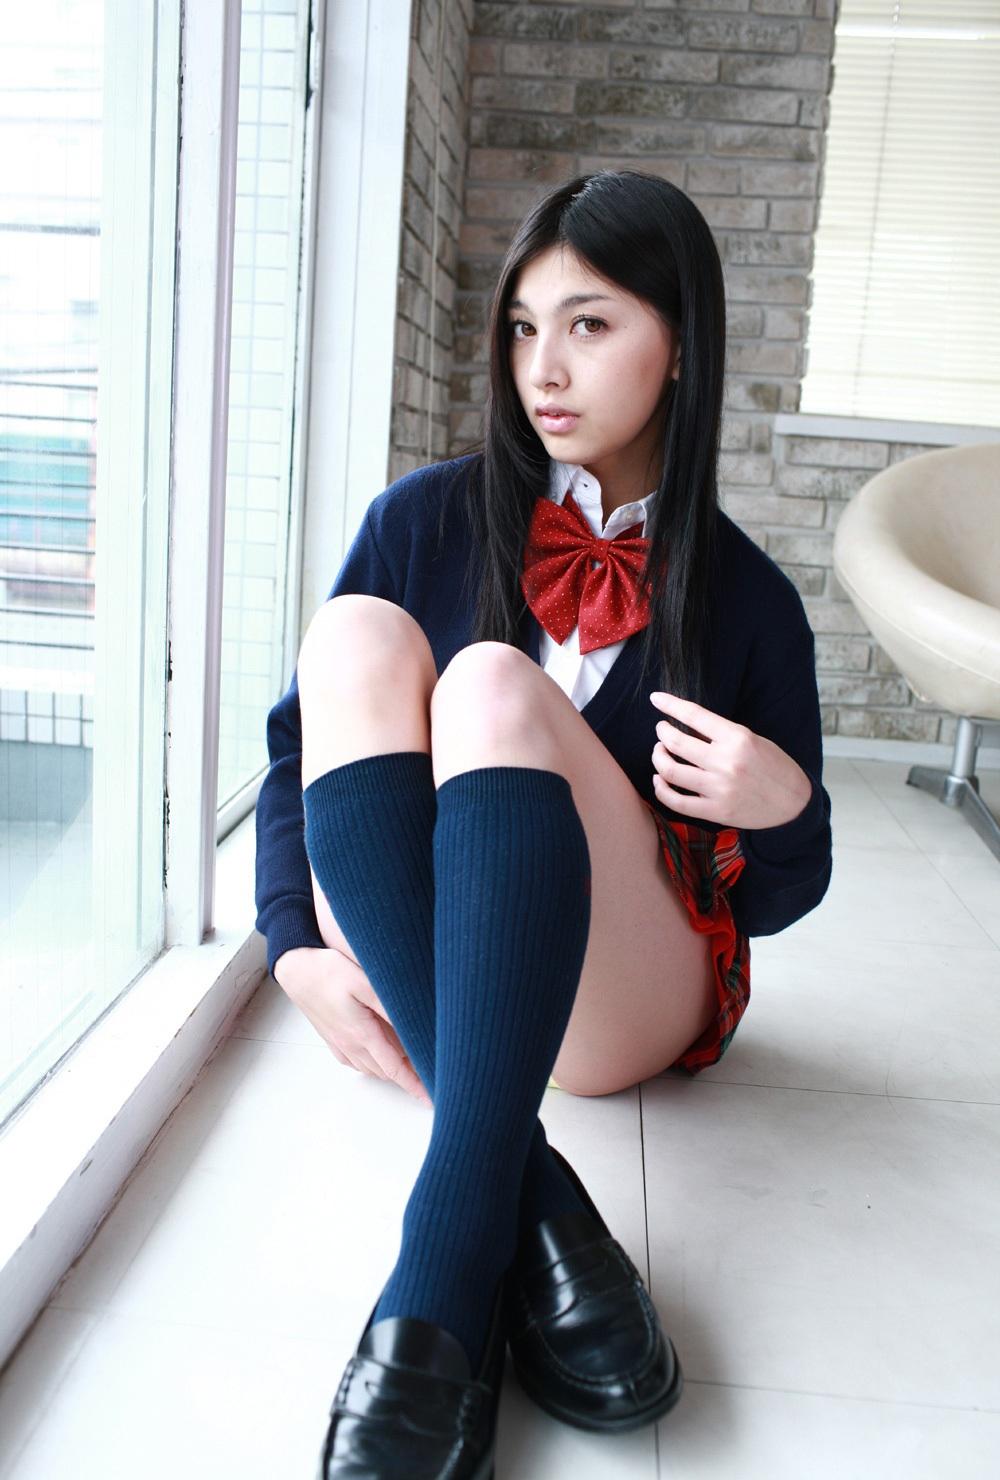 Japanese school girls nude